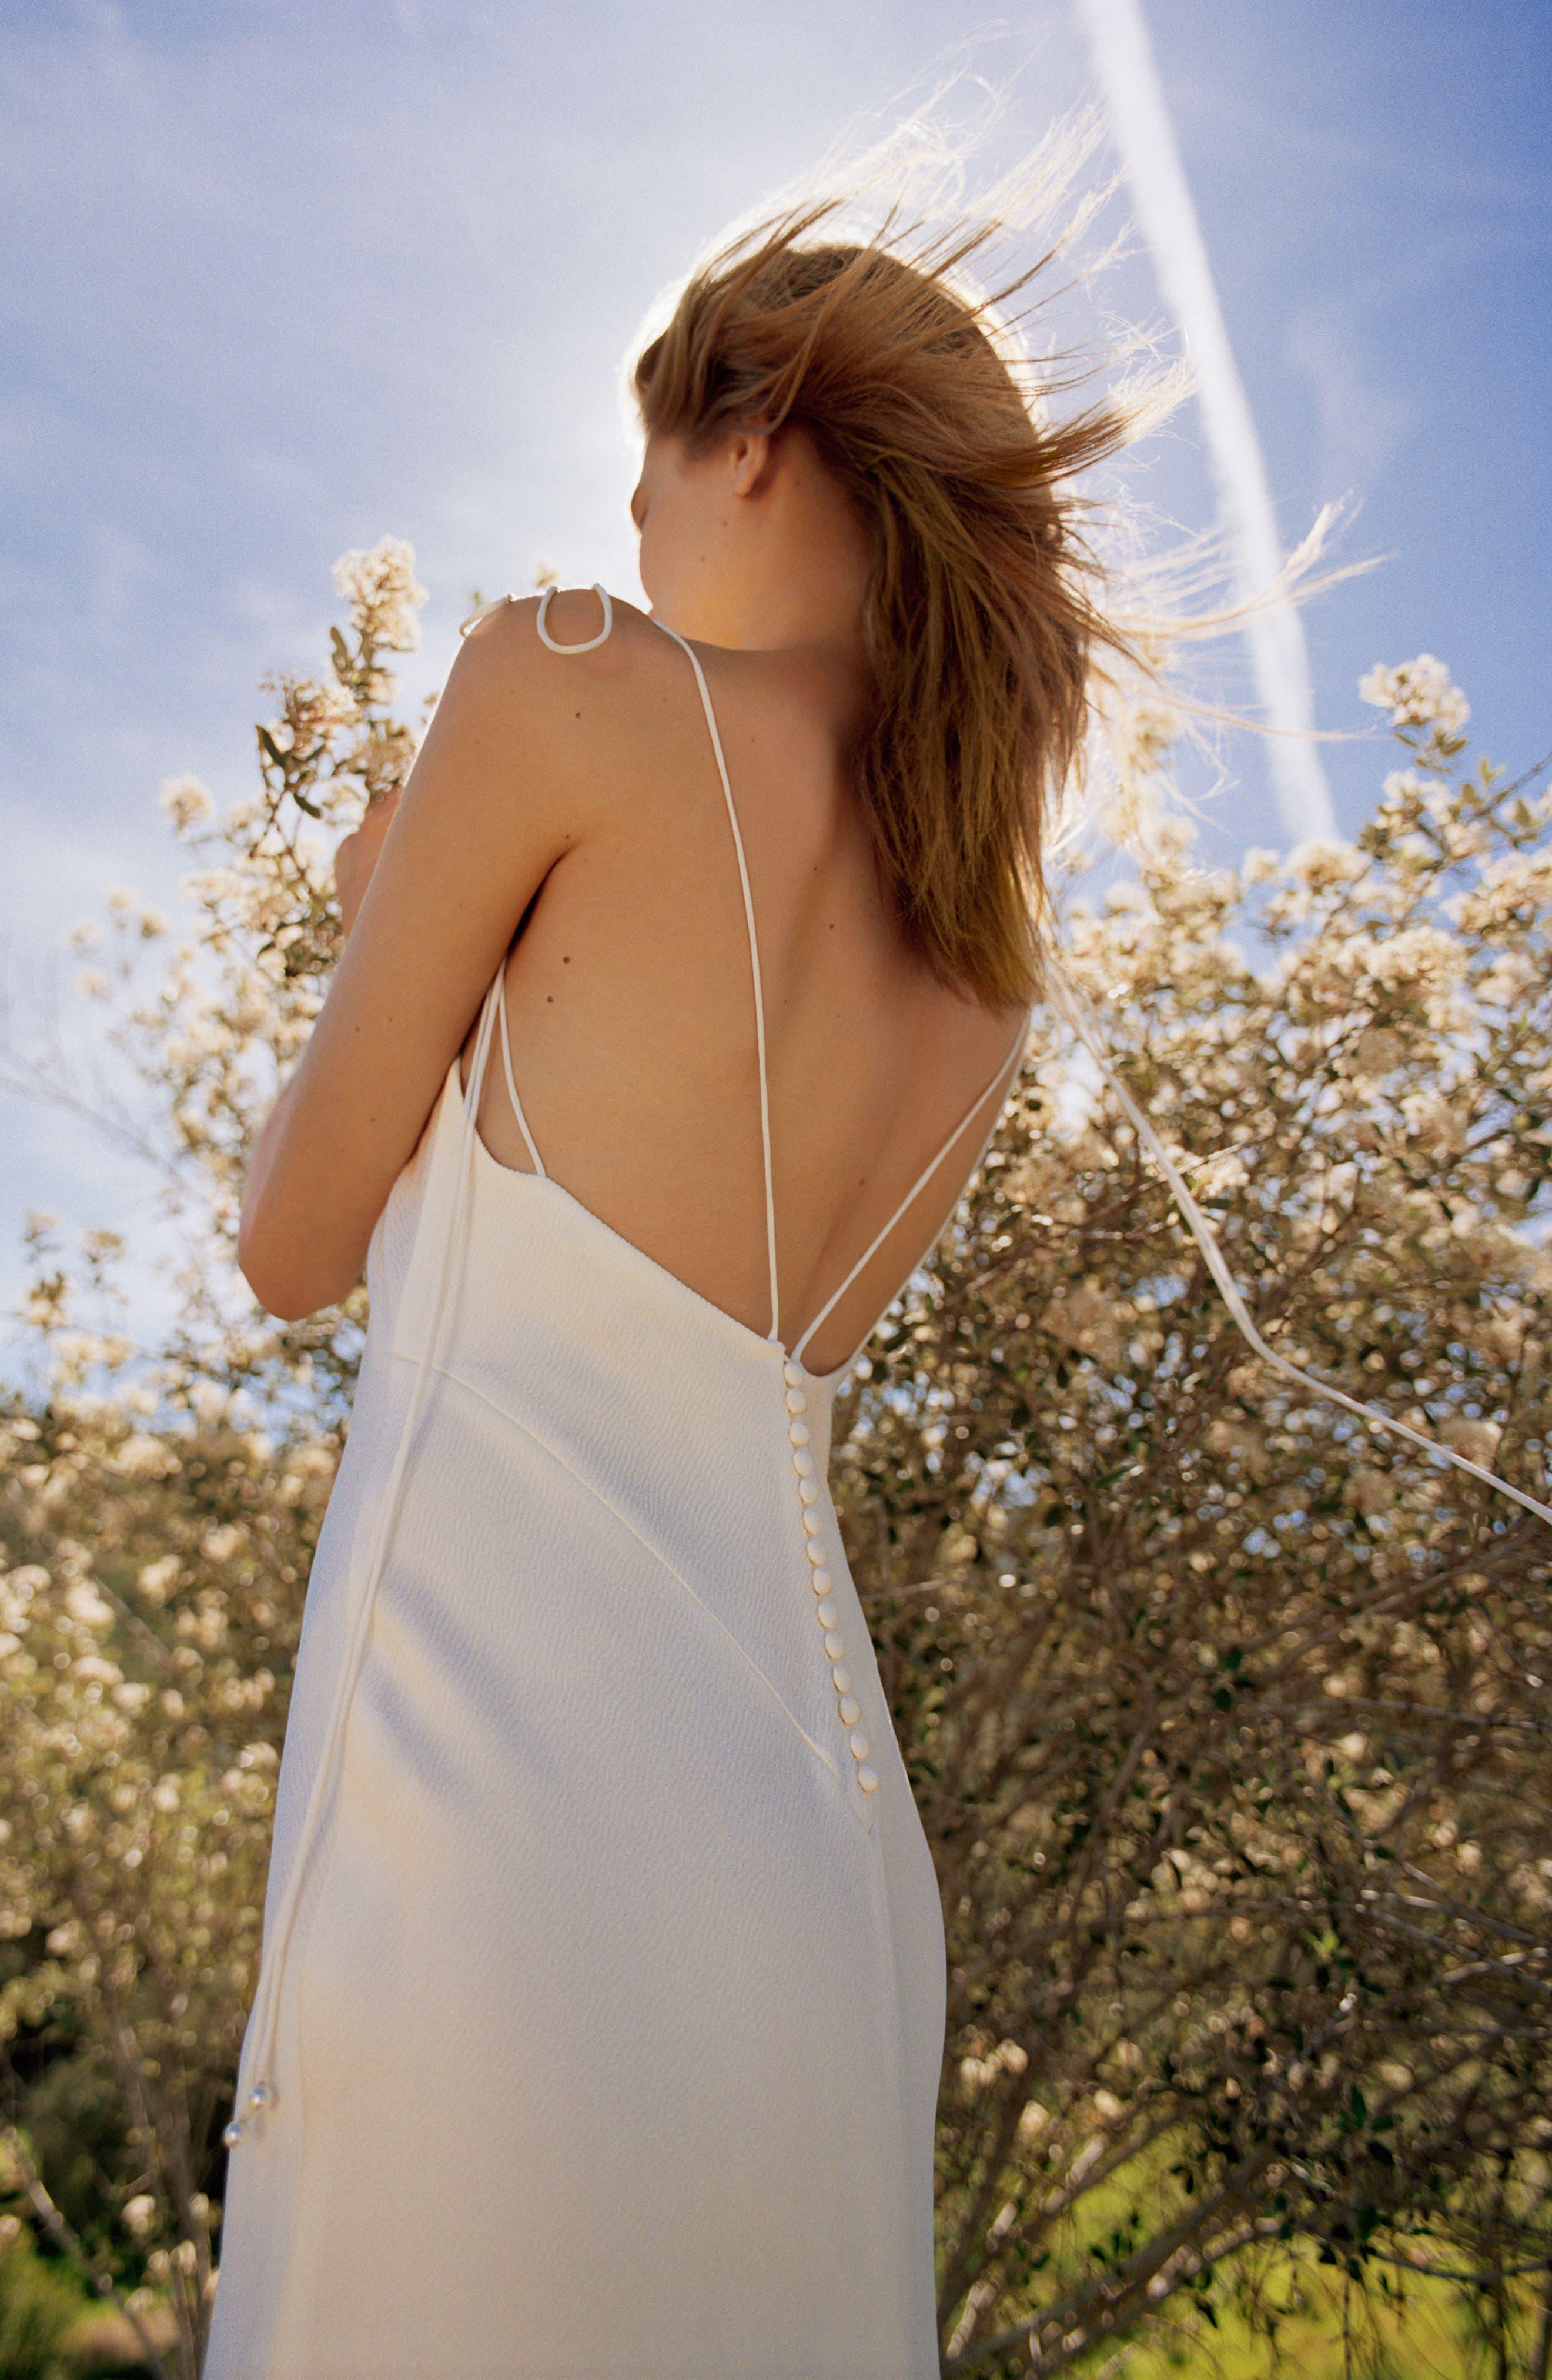 Bride V-Neck Satin Sheath Gown,                             Alternate thumbnail 7, color,                             900